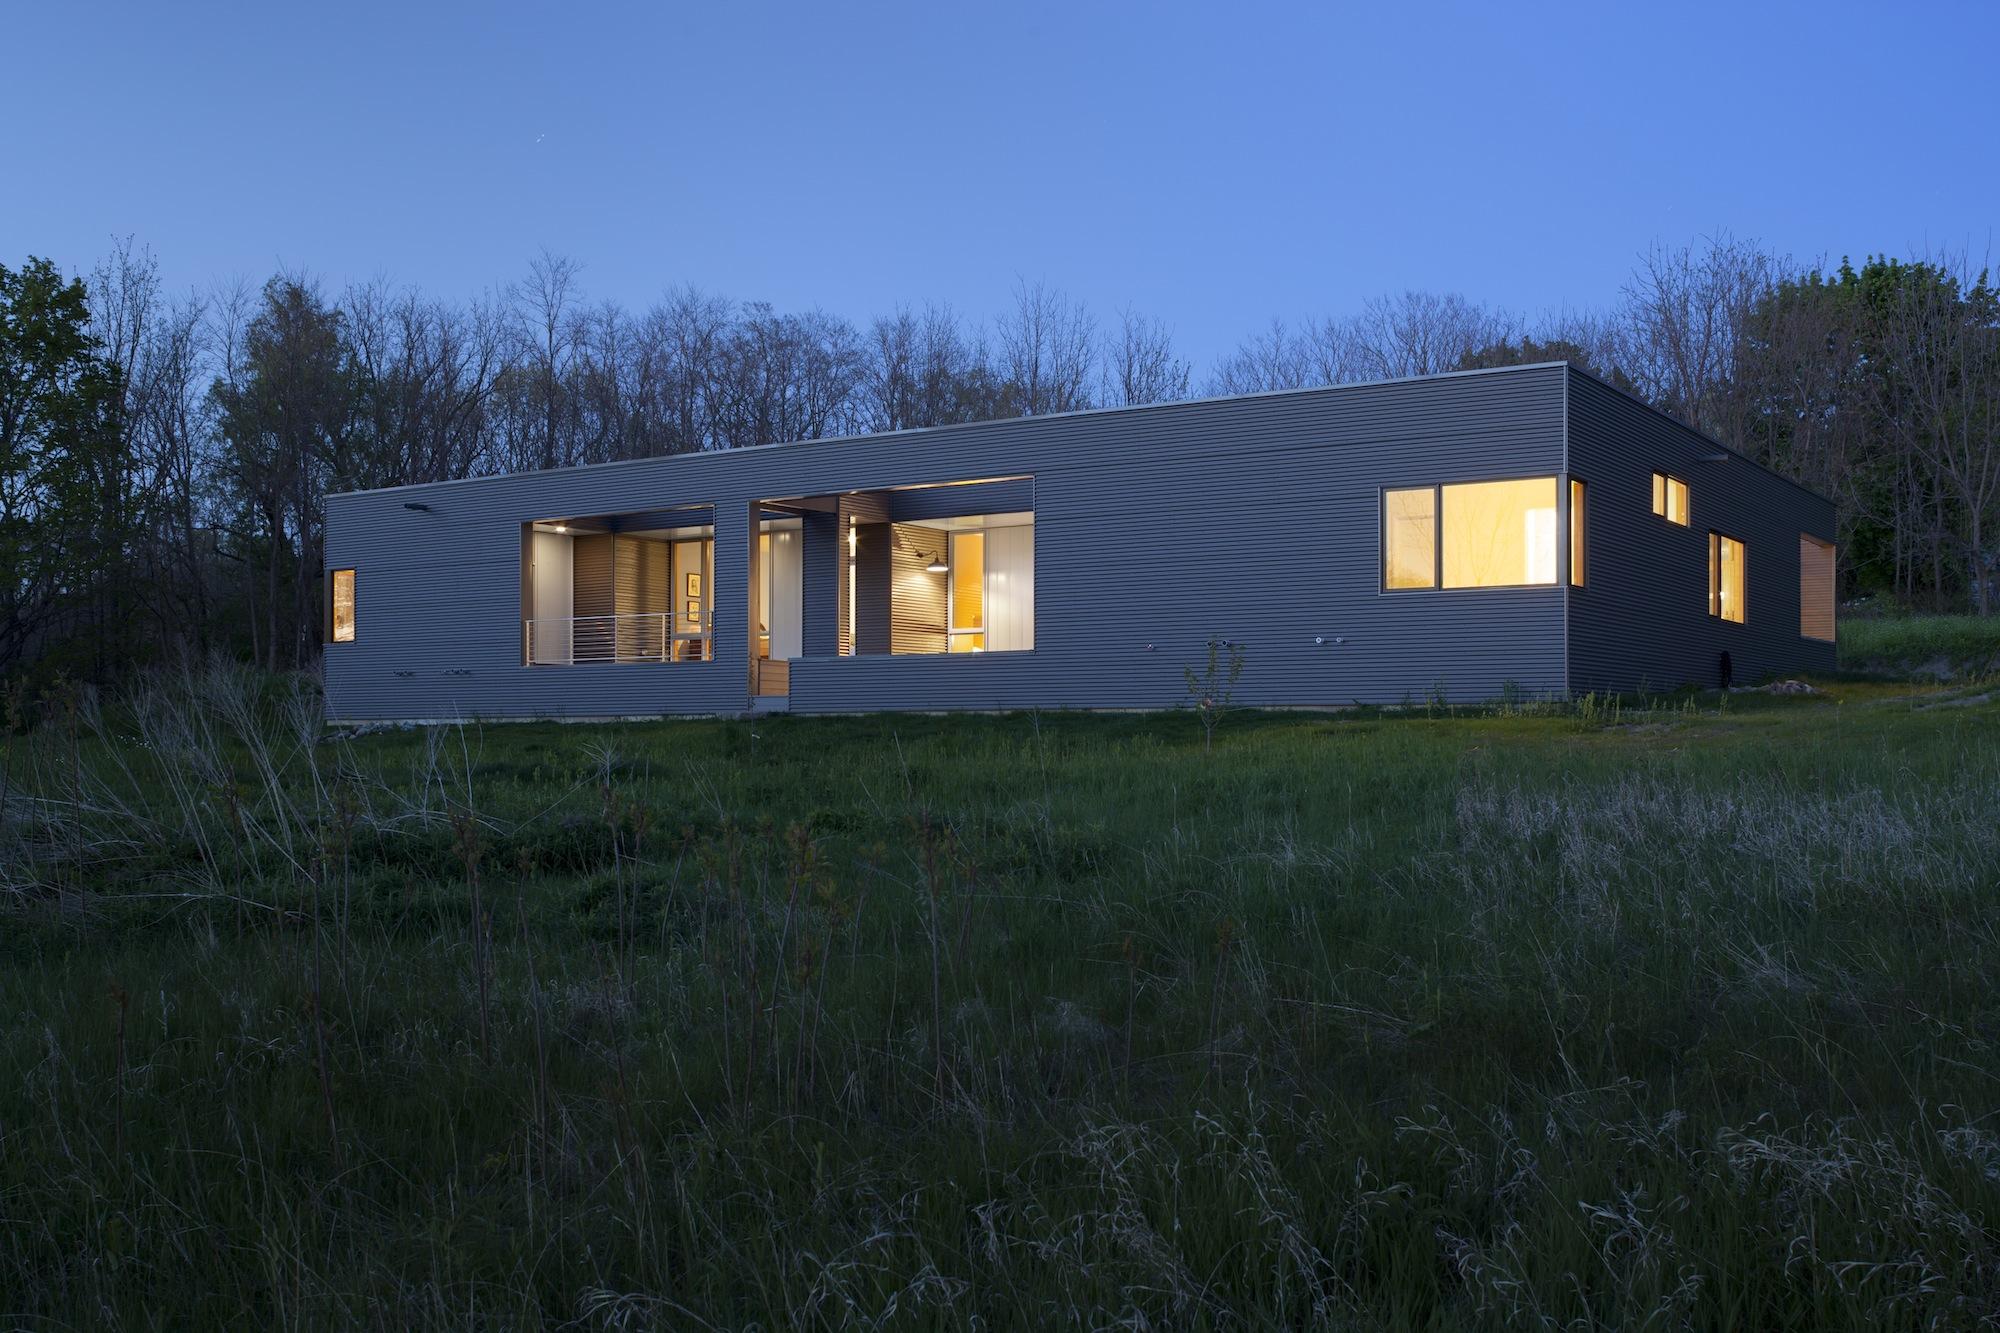 schickel-construction_barkowphoto_night-house.jpg